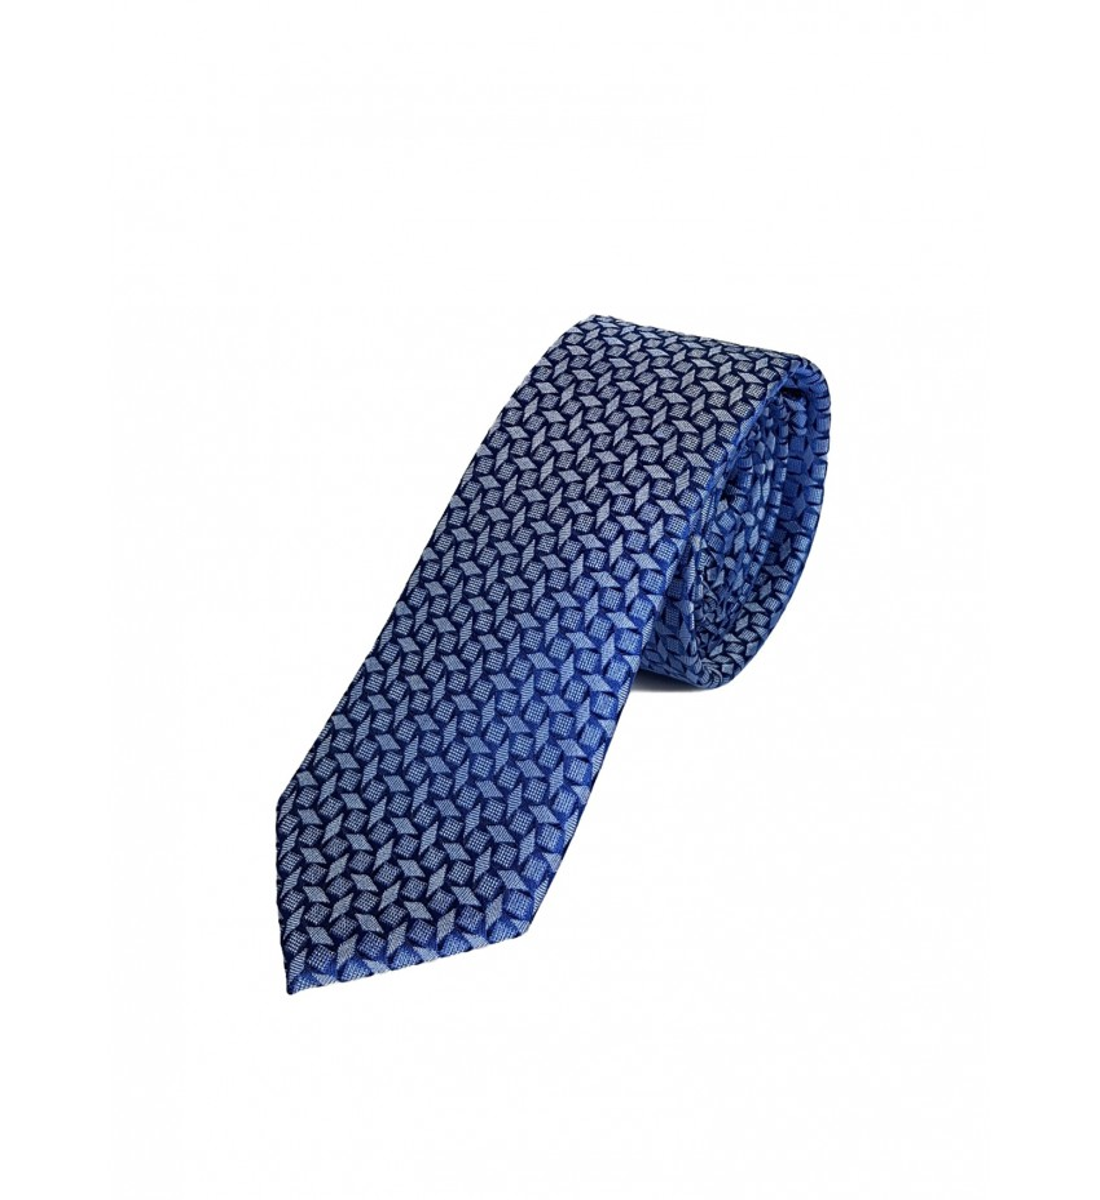 Cravate fine fantaisie 100% soie CIEL